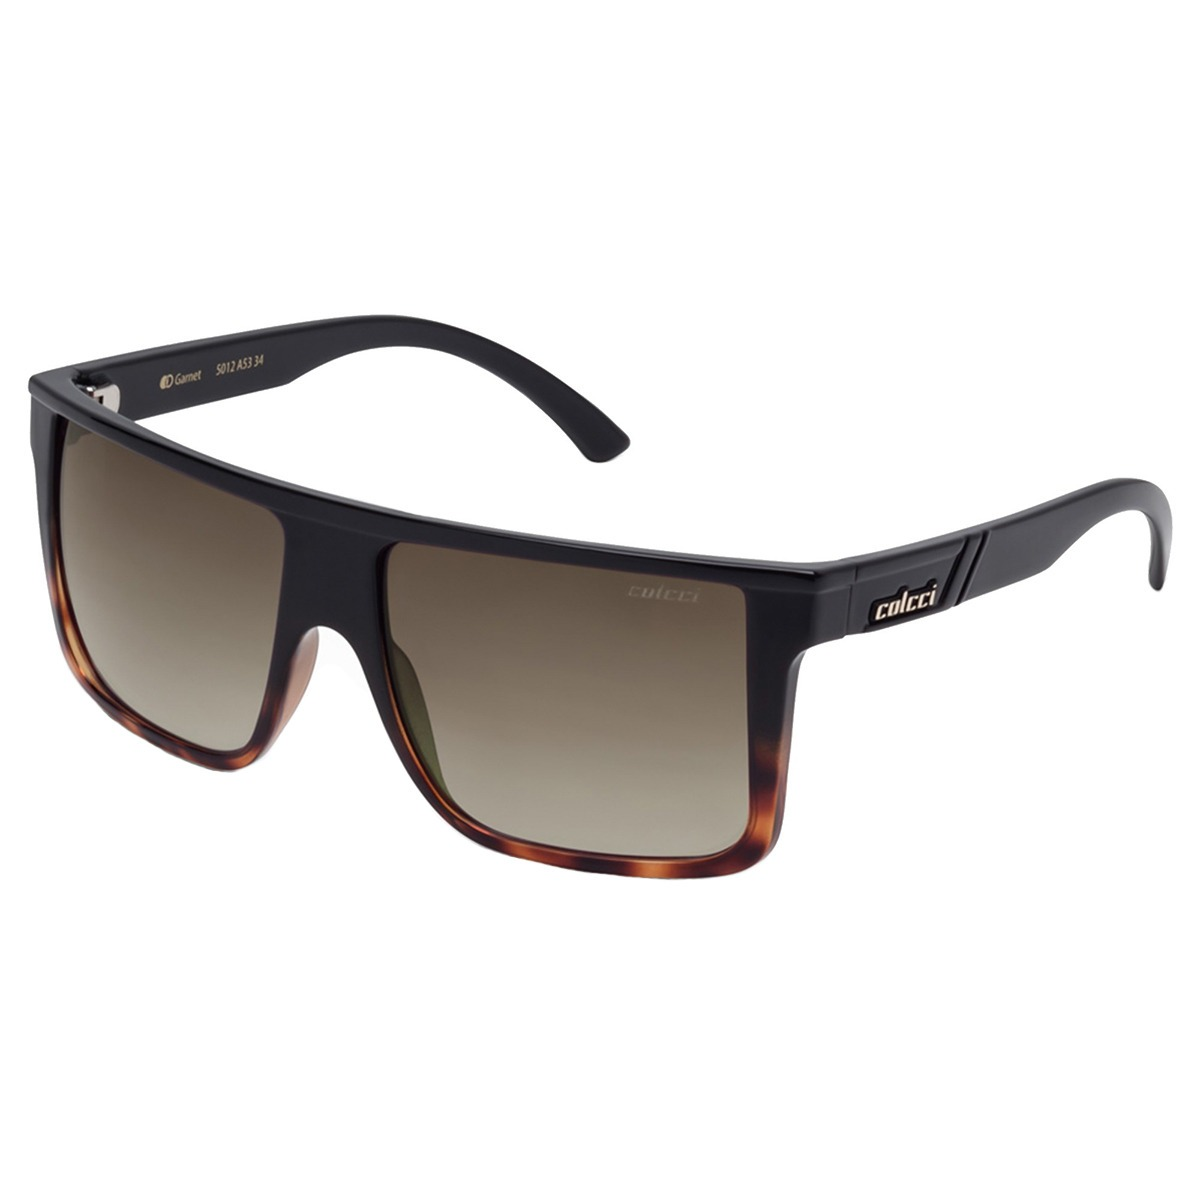 Oculos Sol Colcci Garnet Preto Brilho Marrom Demi Original - R  289 ... 0ae238dfc0